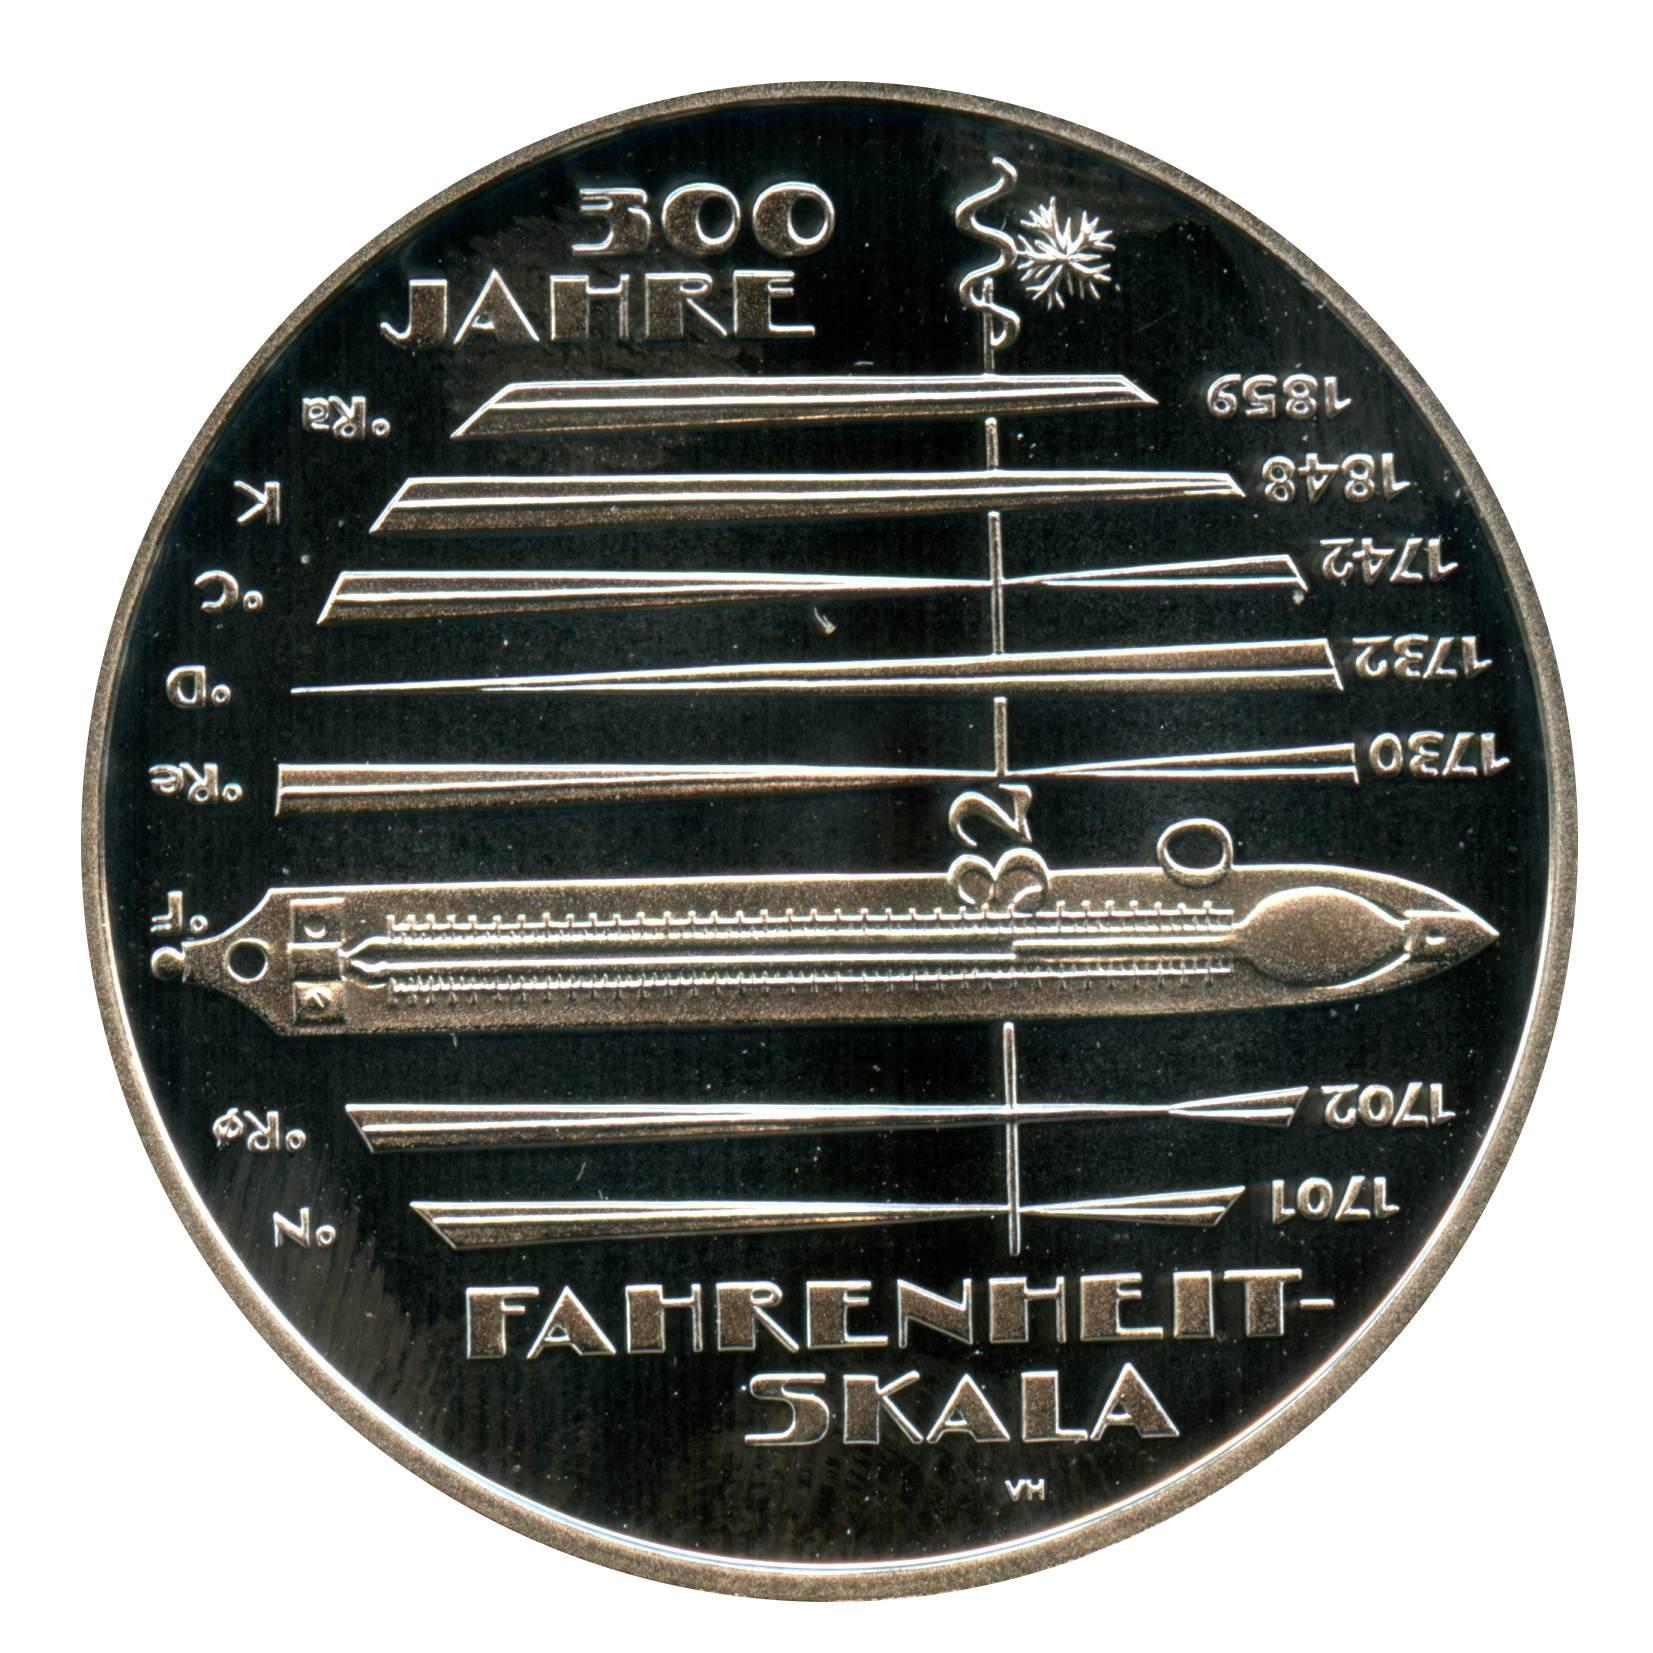 10 Euro 300 Jahre Fahrenheit 2014 J